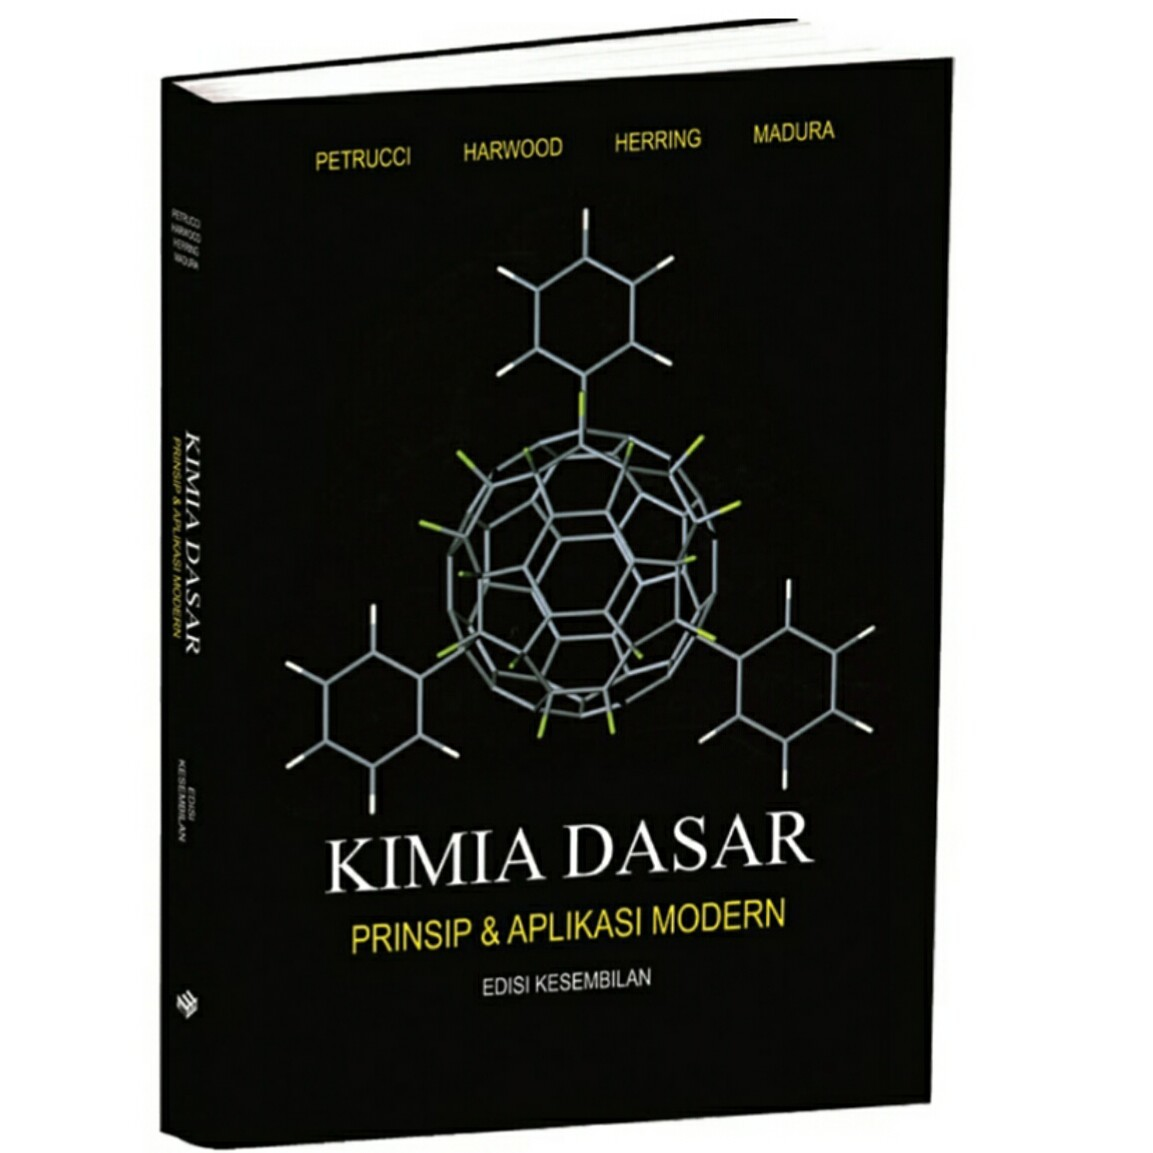 Jual Erlangga Buku Kimia Dasar Prinsip Aplikasi Modern Jl 1 Ed 9